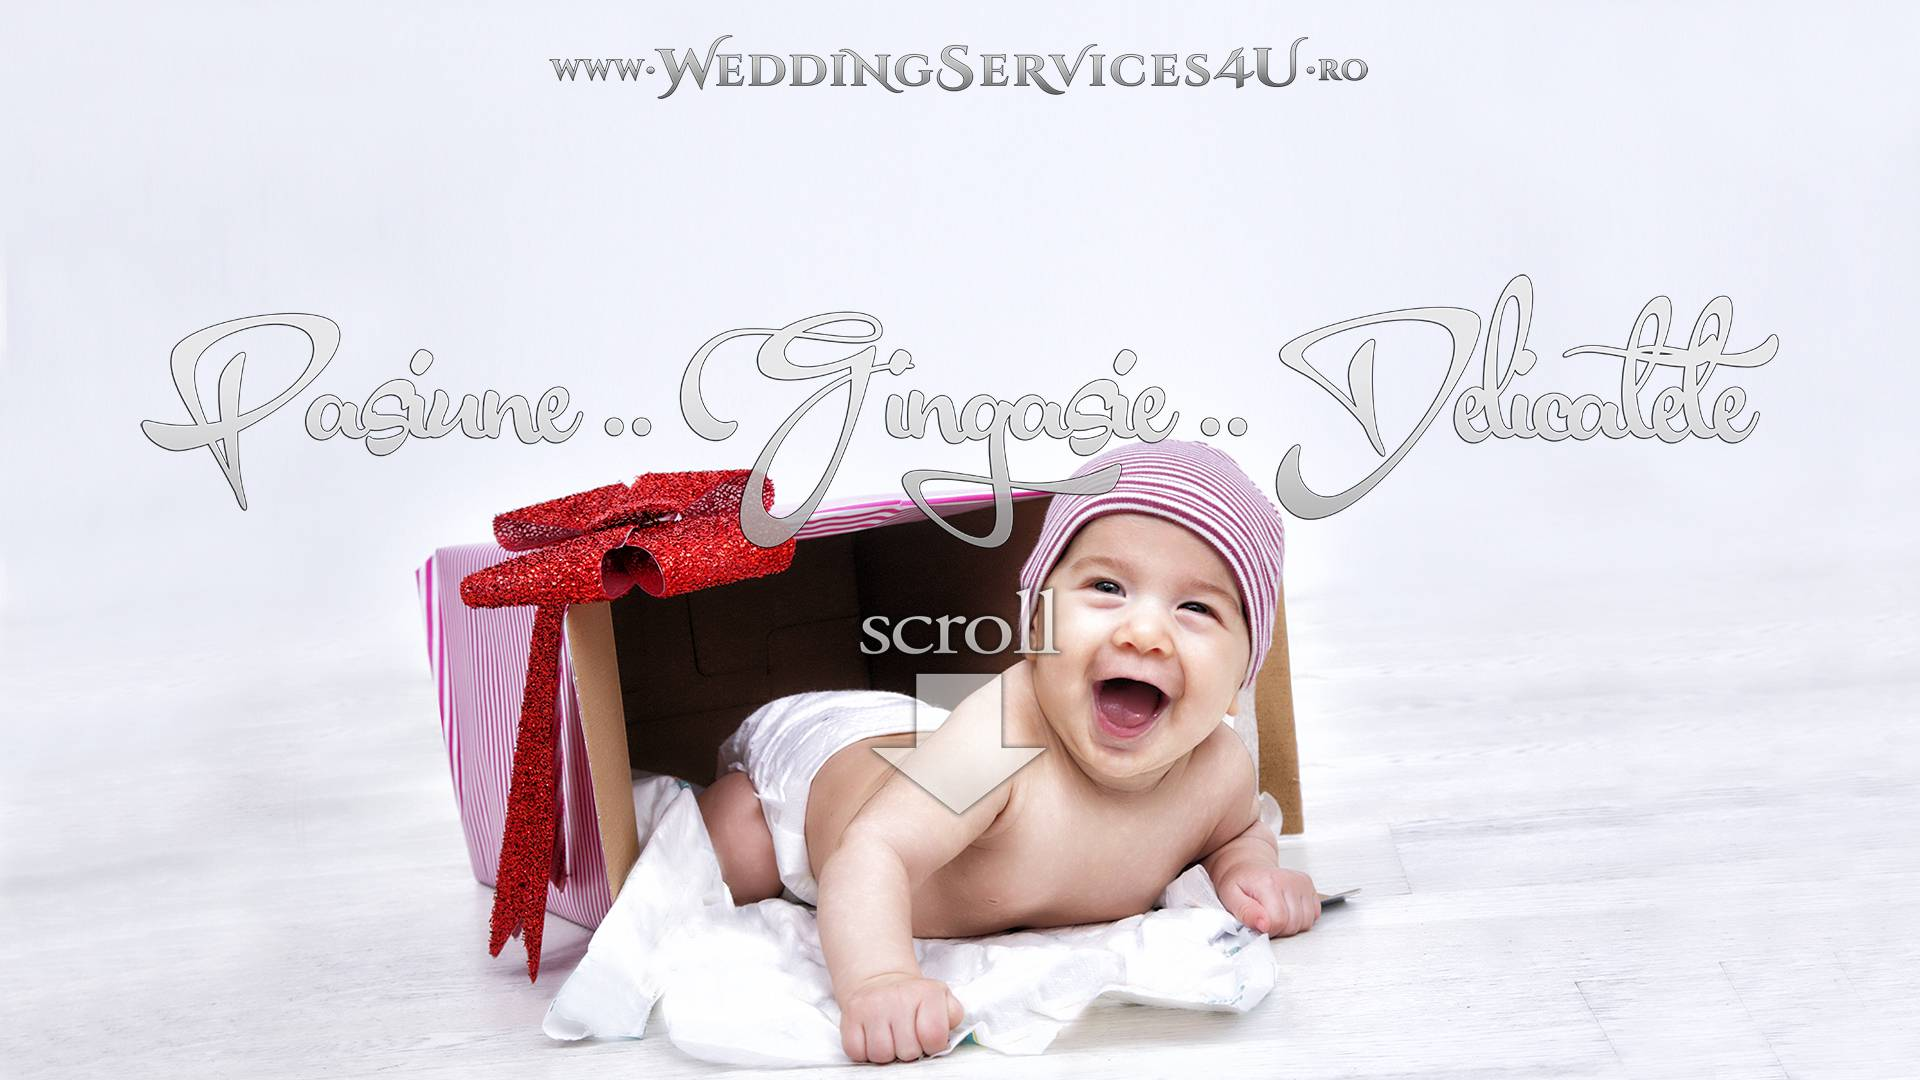 WeddingServices4U.ro Fotografie de Copii, Bebelusi, Nou Nascuti, Gravide, Mamici si Parinti in Studio Foto sau Exterior